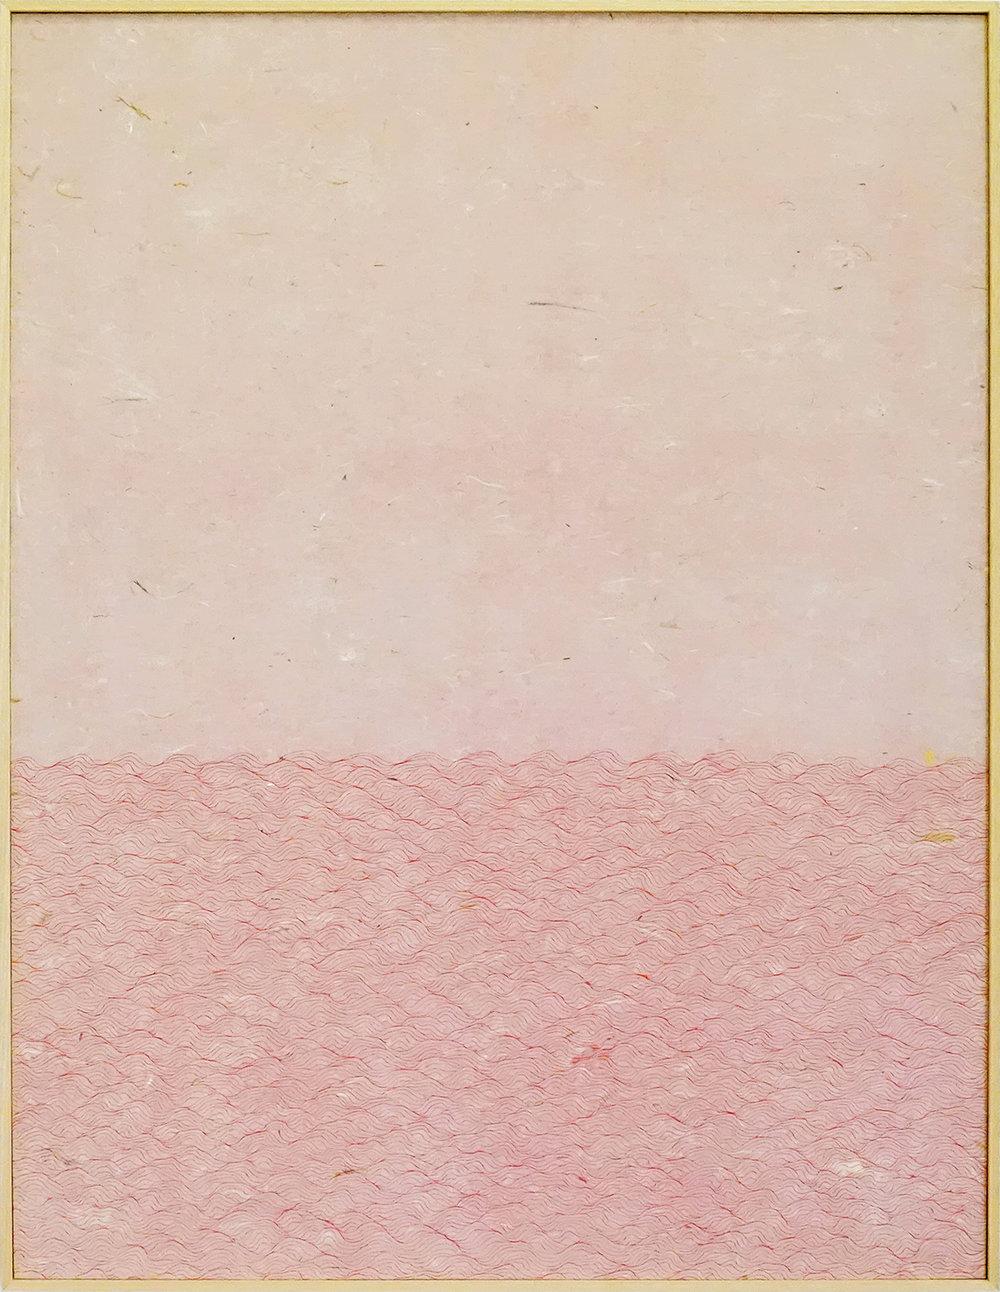 Zhou Jianjun 周建军, Red 红色, 2013, Ink on paper 纸本水墨设色, 93 x 122 cm